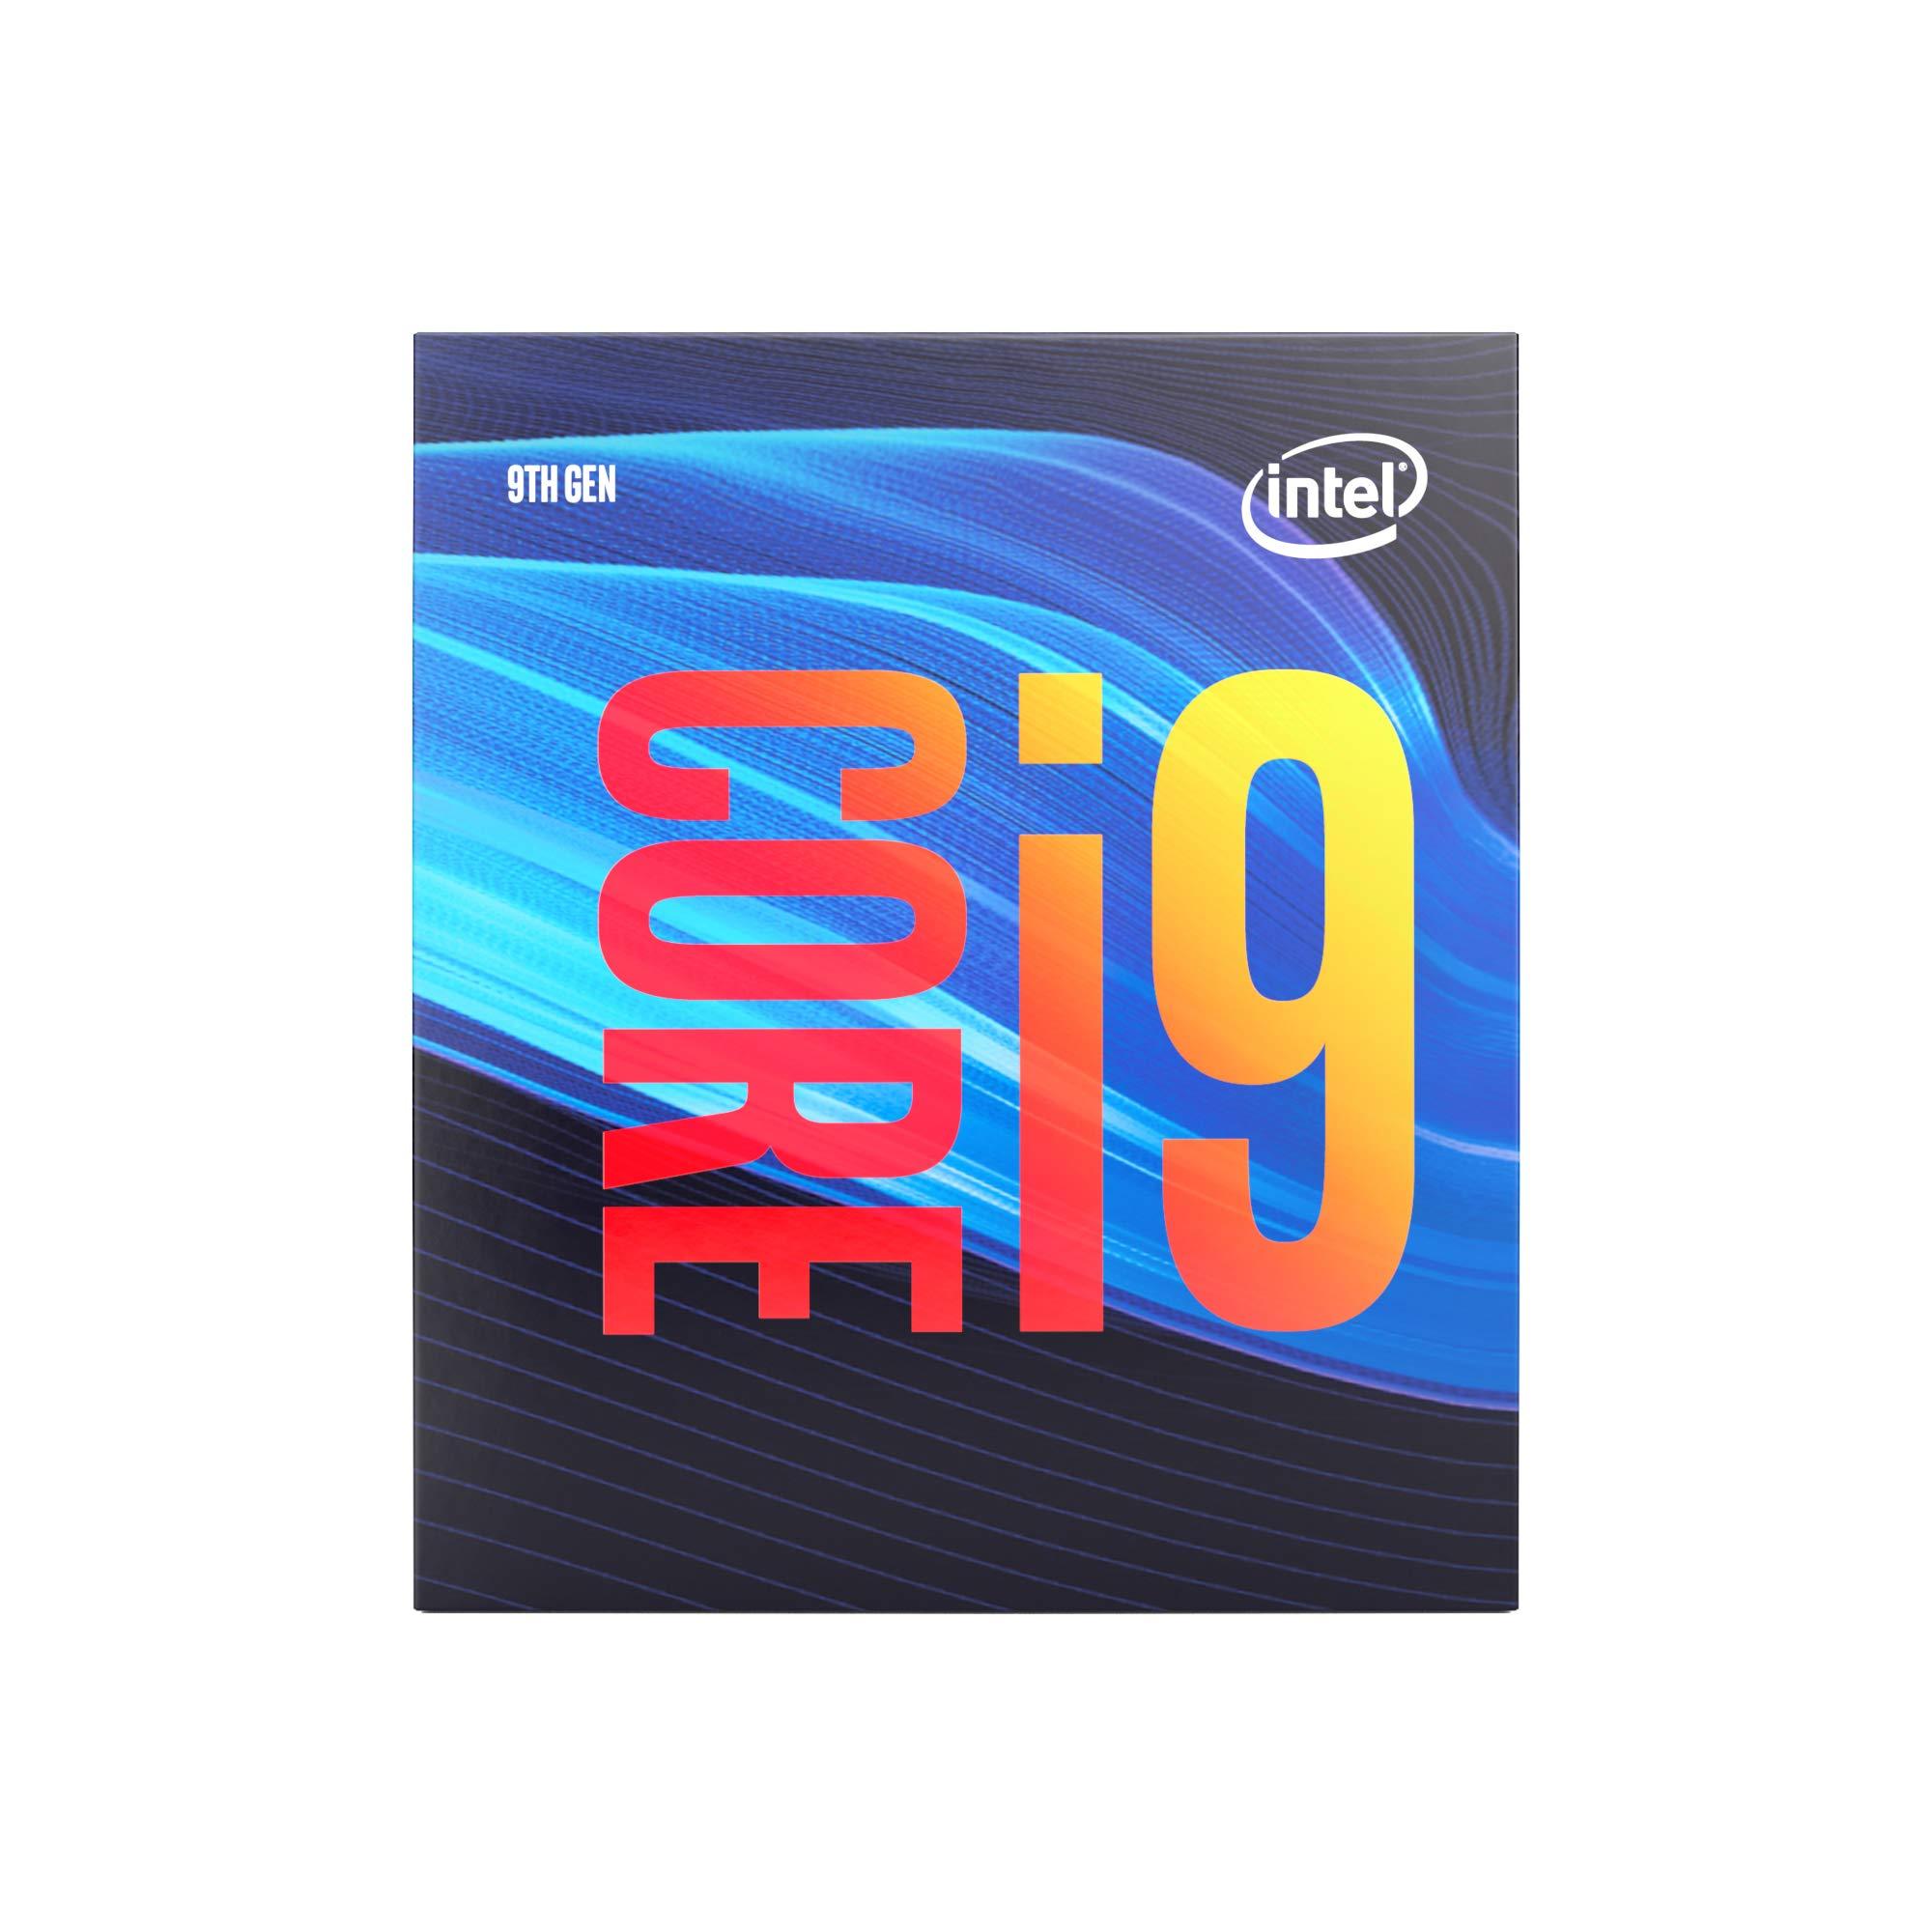 Intel Core i9-9900 Desktop Processor 8 Cores up to 5.0GHz LGA1151 300 Series 65W by Intel